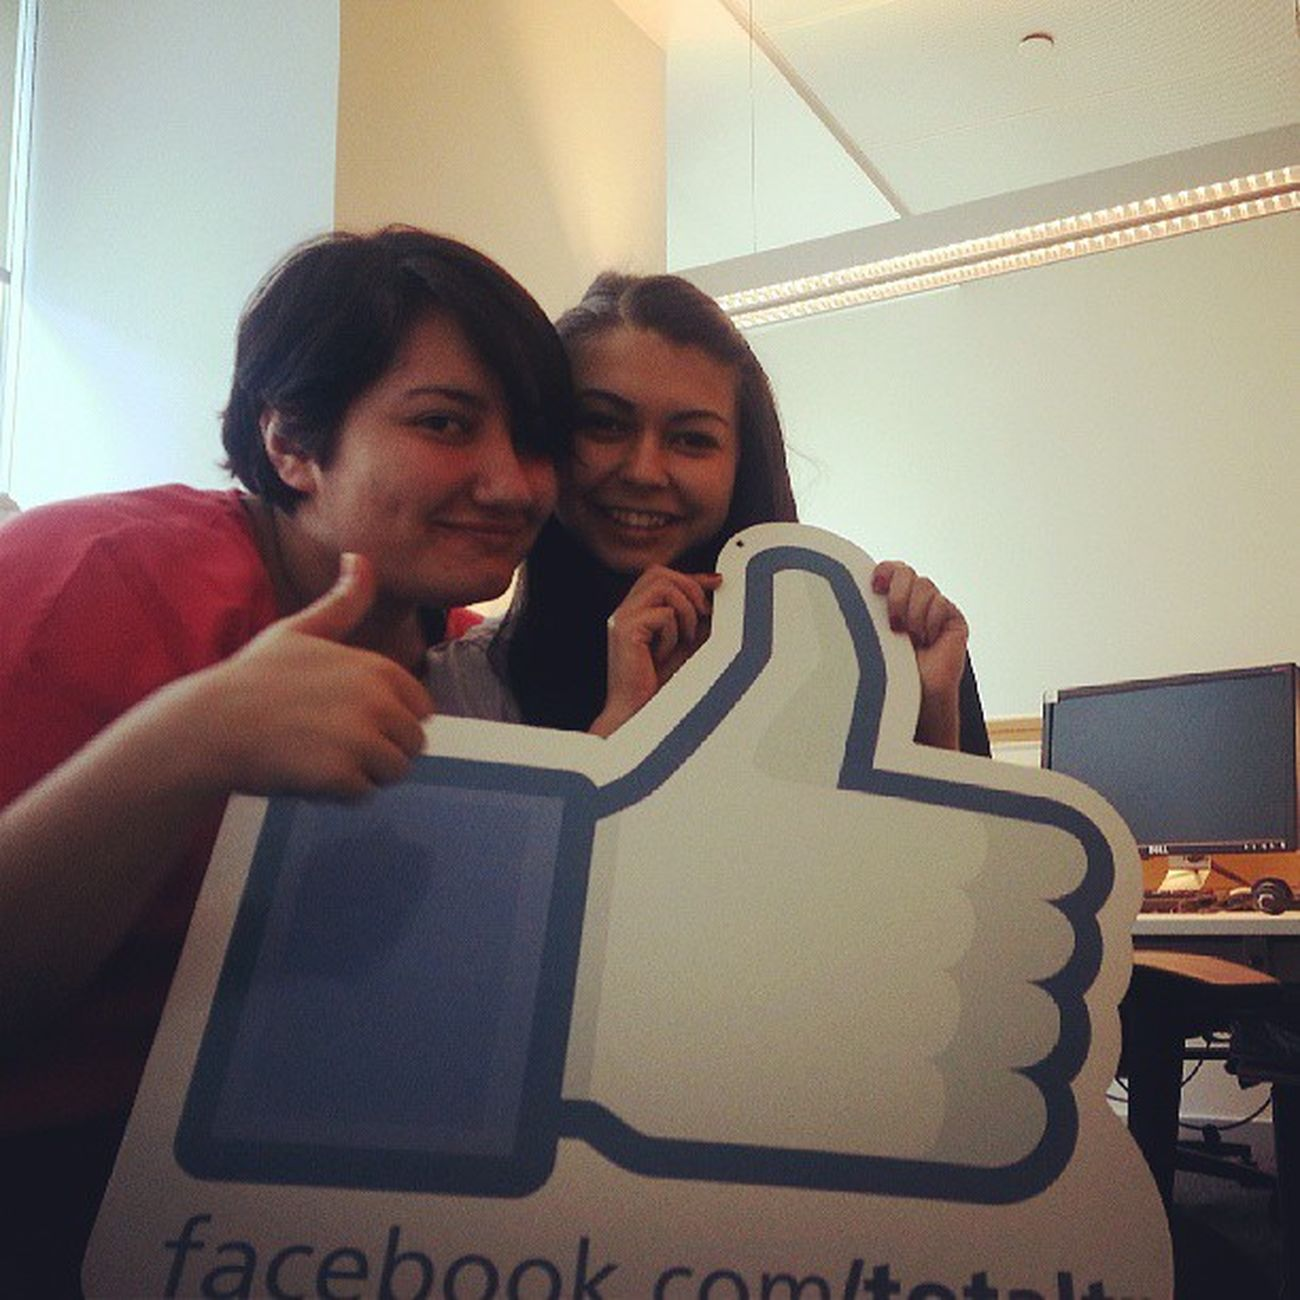 Facebook Like Total Totalturkiye love-like relationship ^^